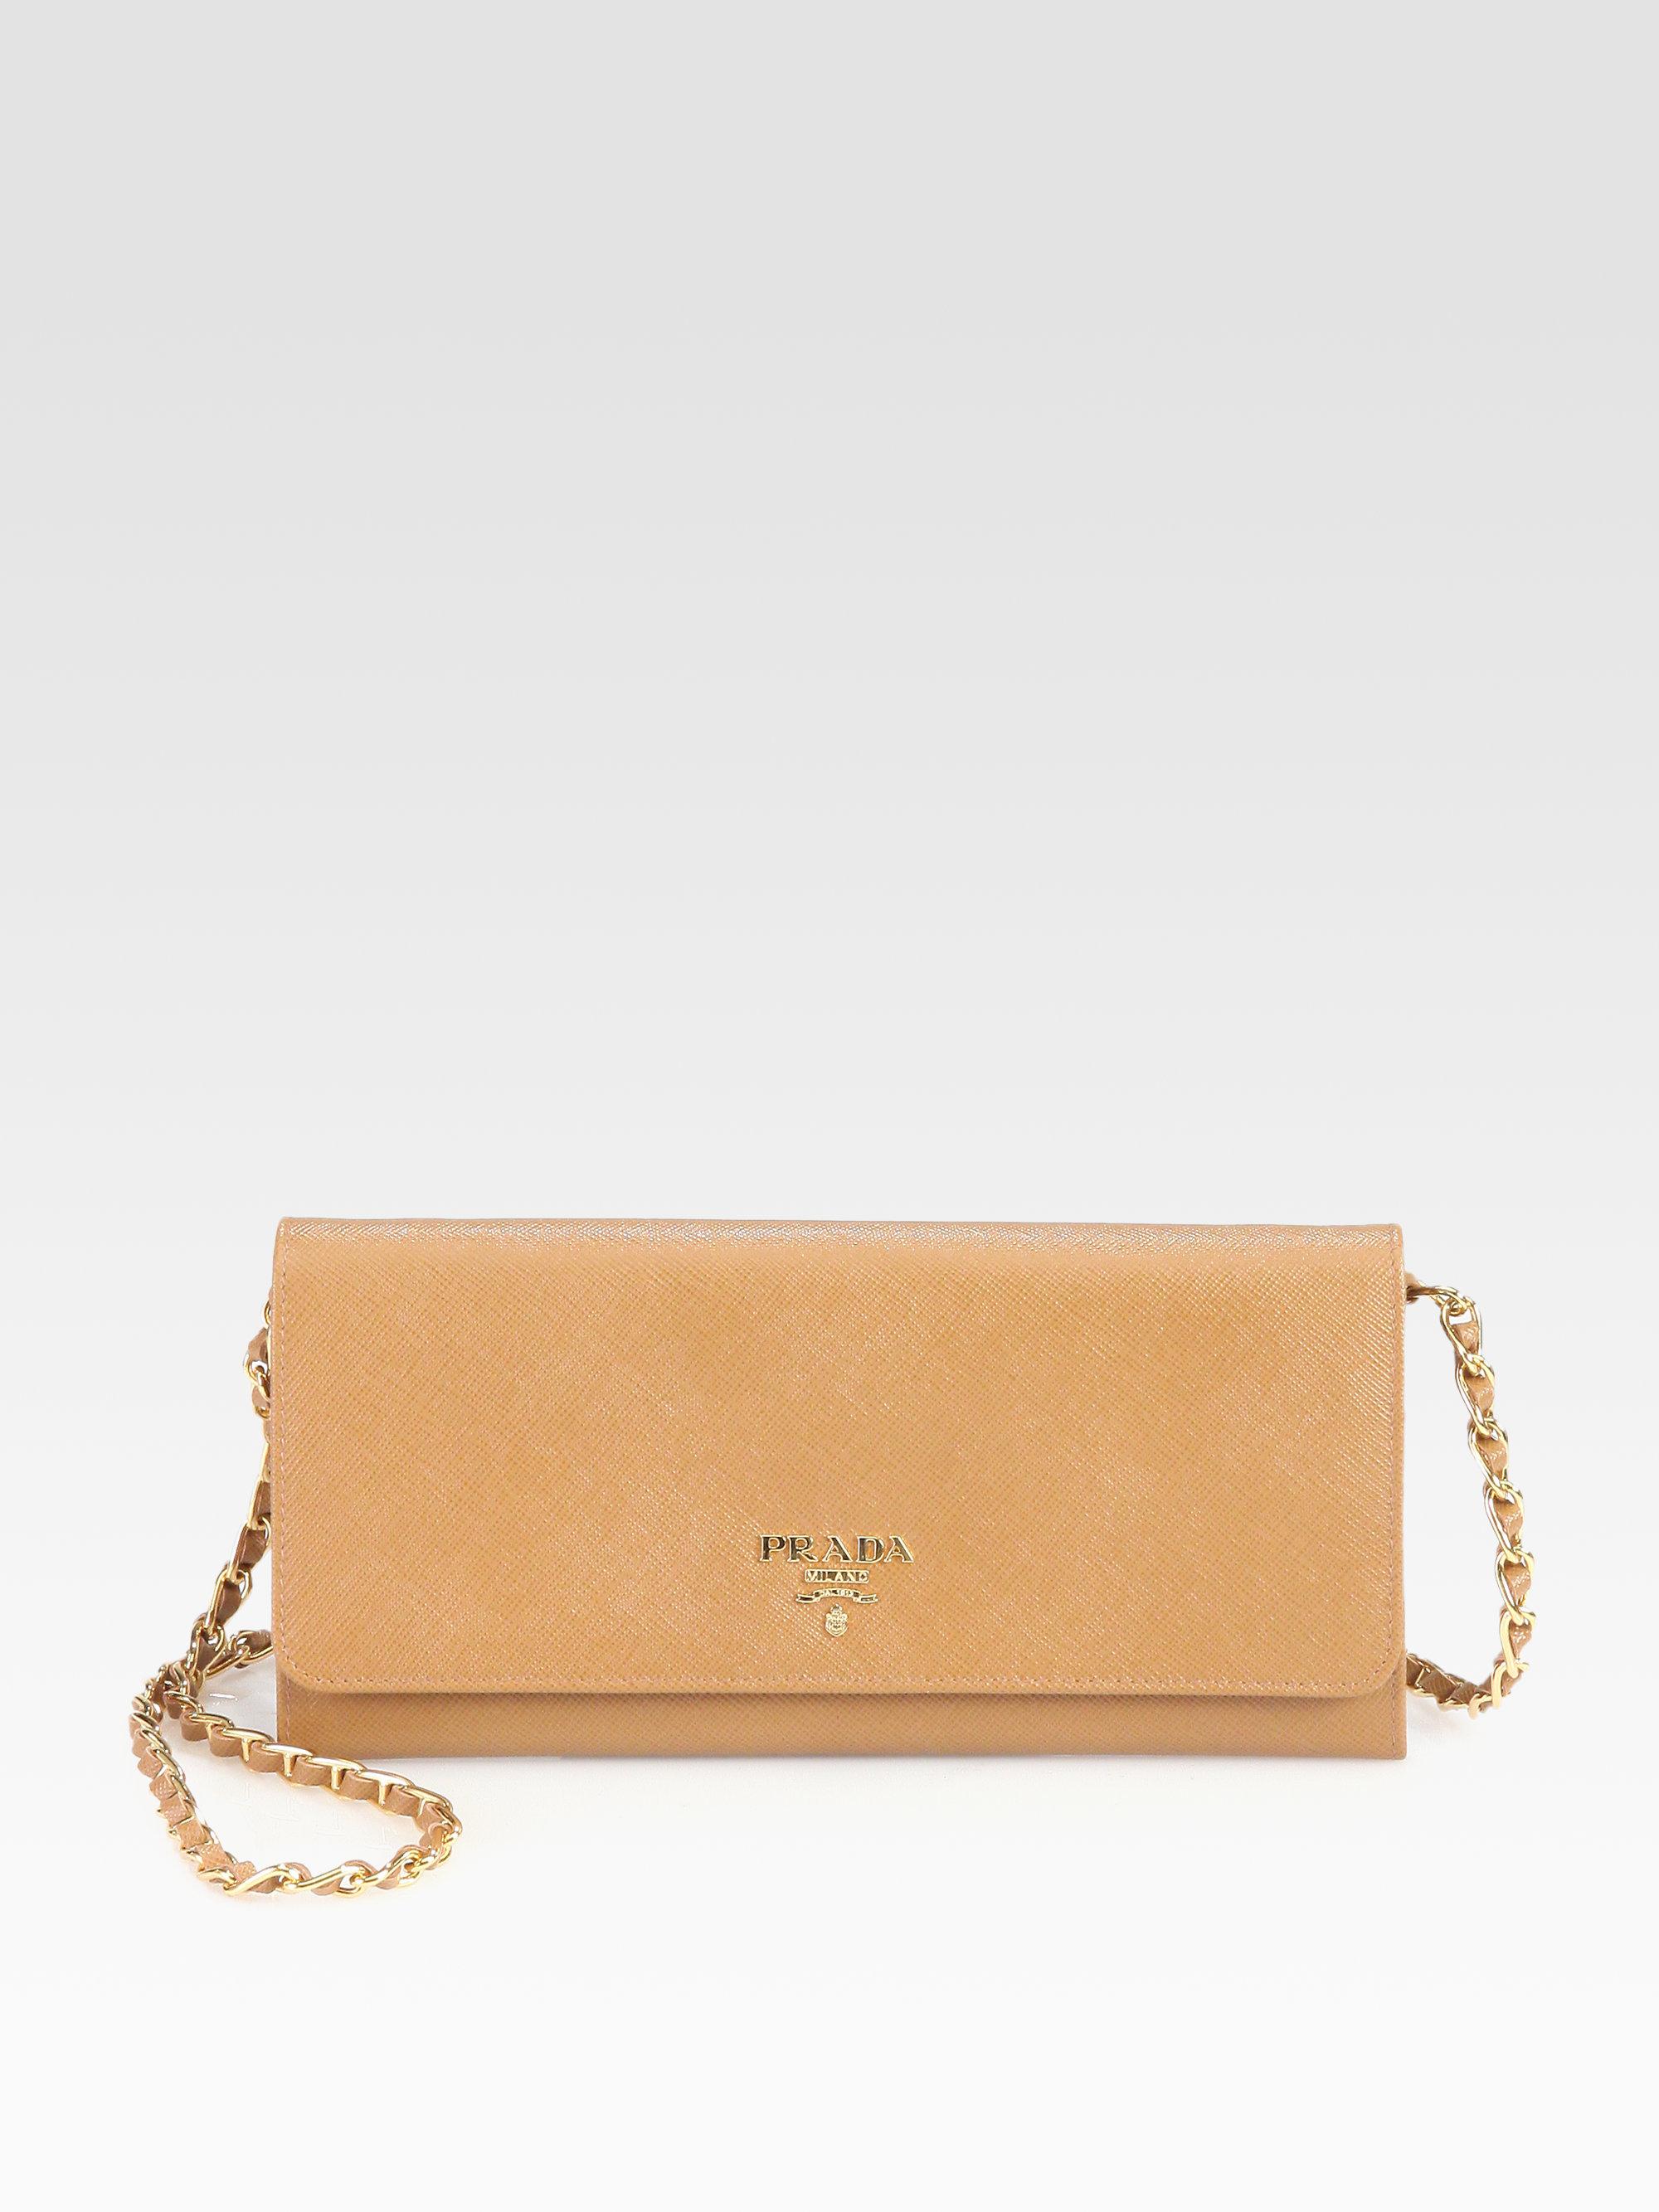 official store prada saffiano leather key holder wallet nero black ae45e  6c4d0  get lyst prada saffiano metal oro chain wallet in brown b88d4 55a92 7f57b7f9dc54c